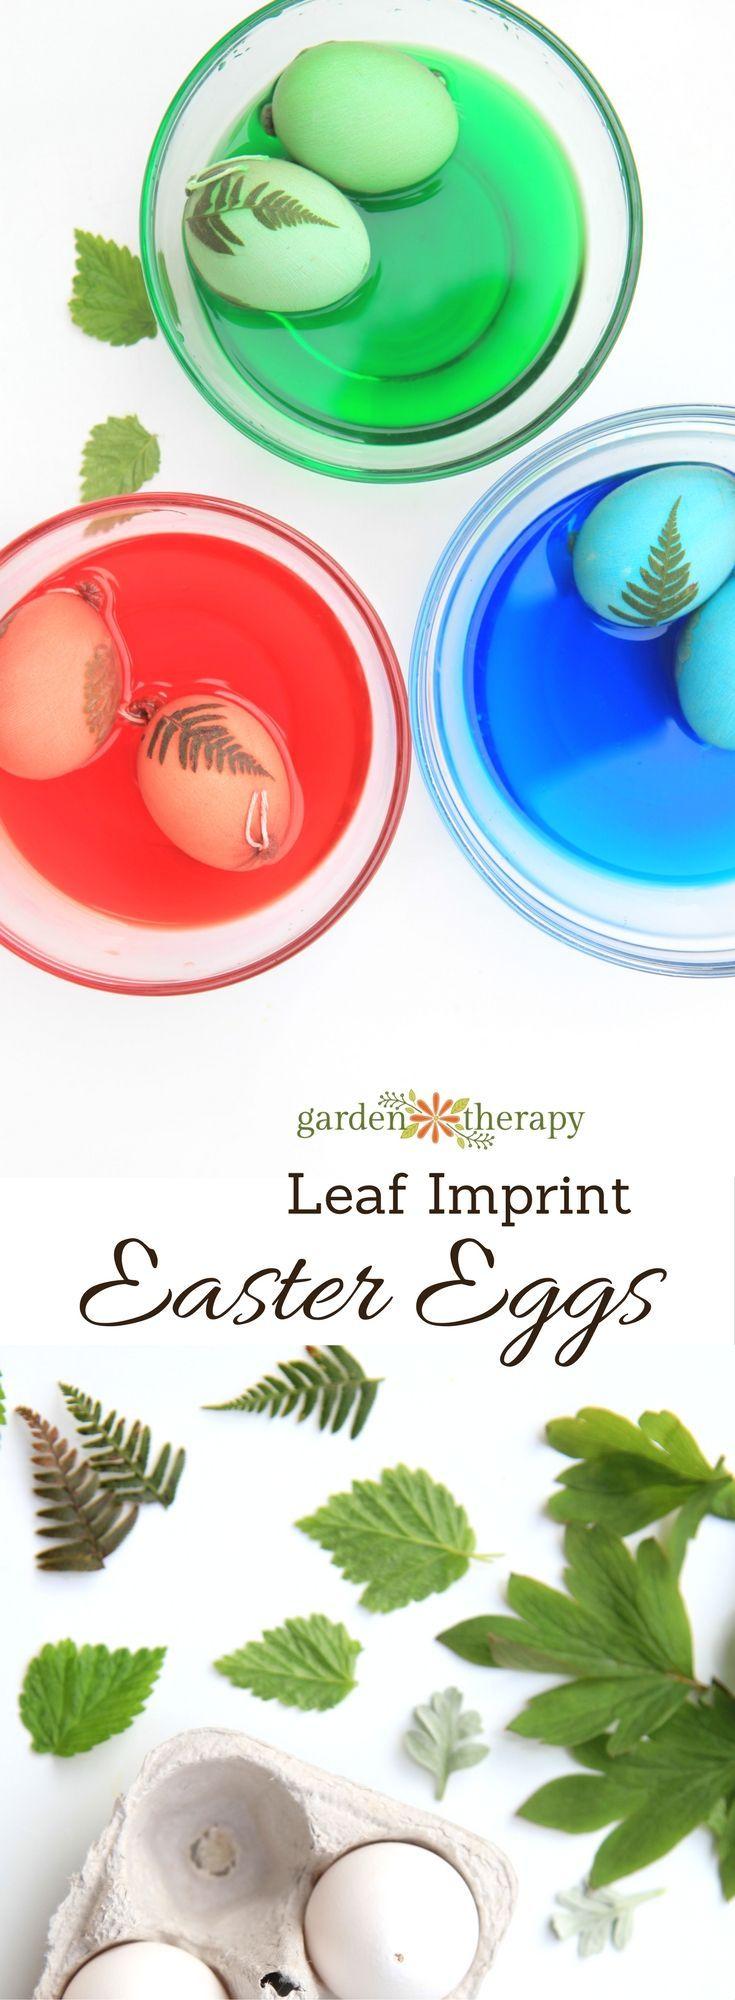 How to make dyed leaf imprint Easter eggs using botanicals. #gardentherapy #easter #easteregg #garden #leaf #naturecraft